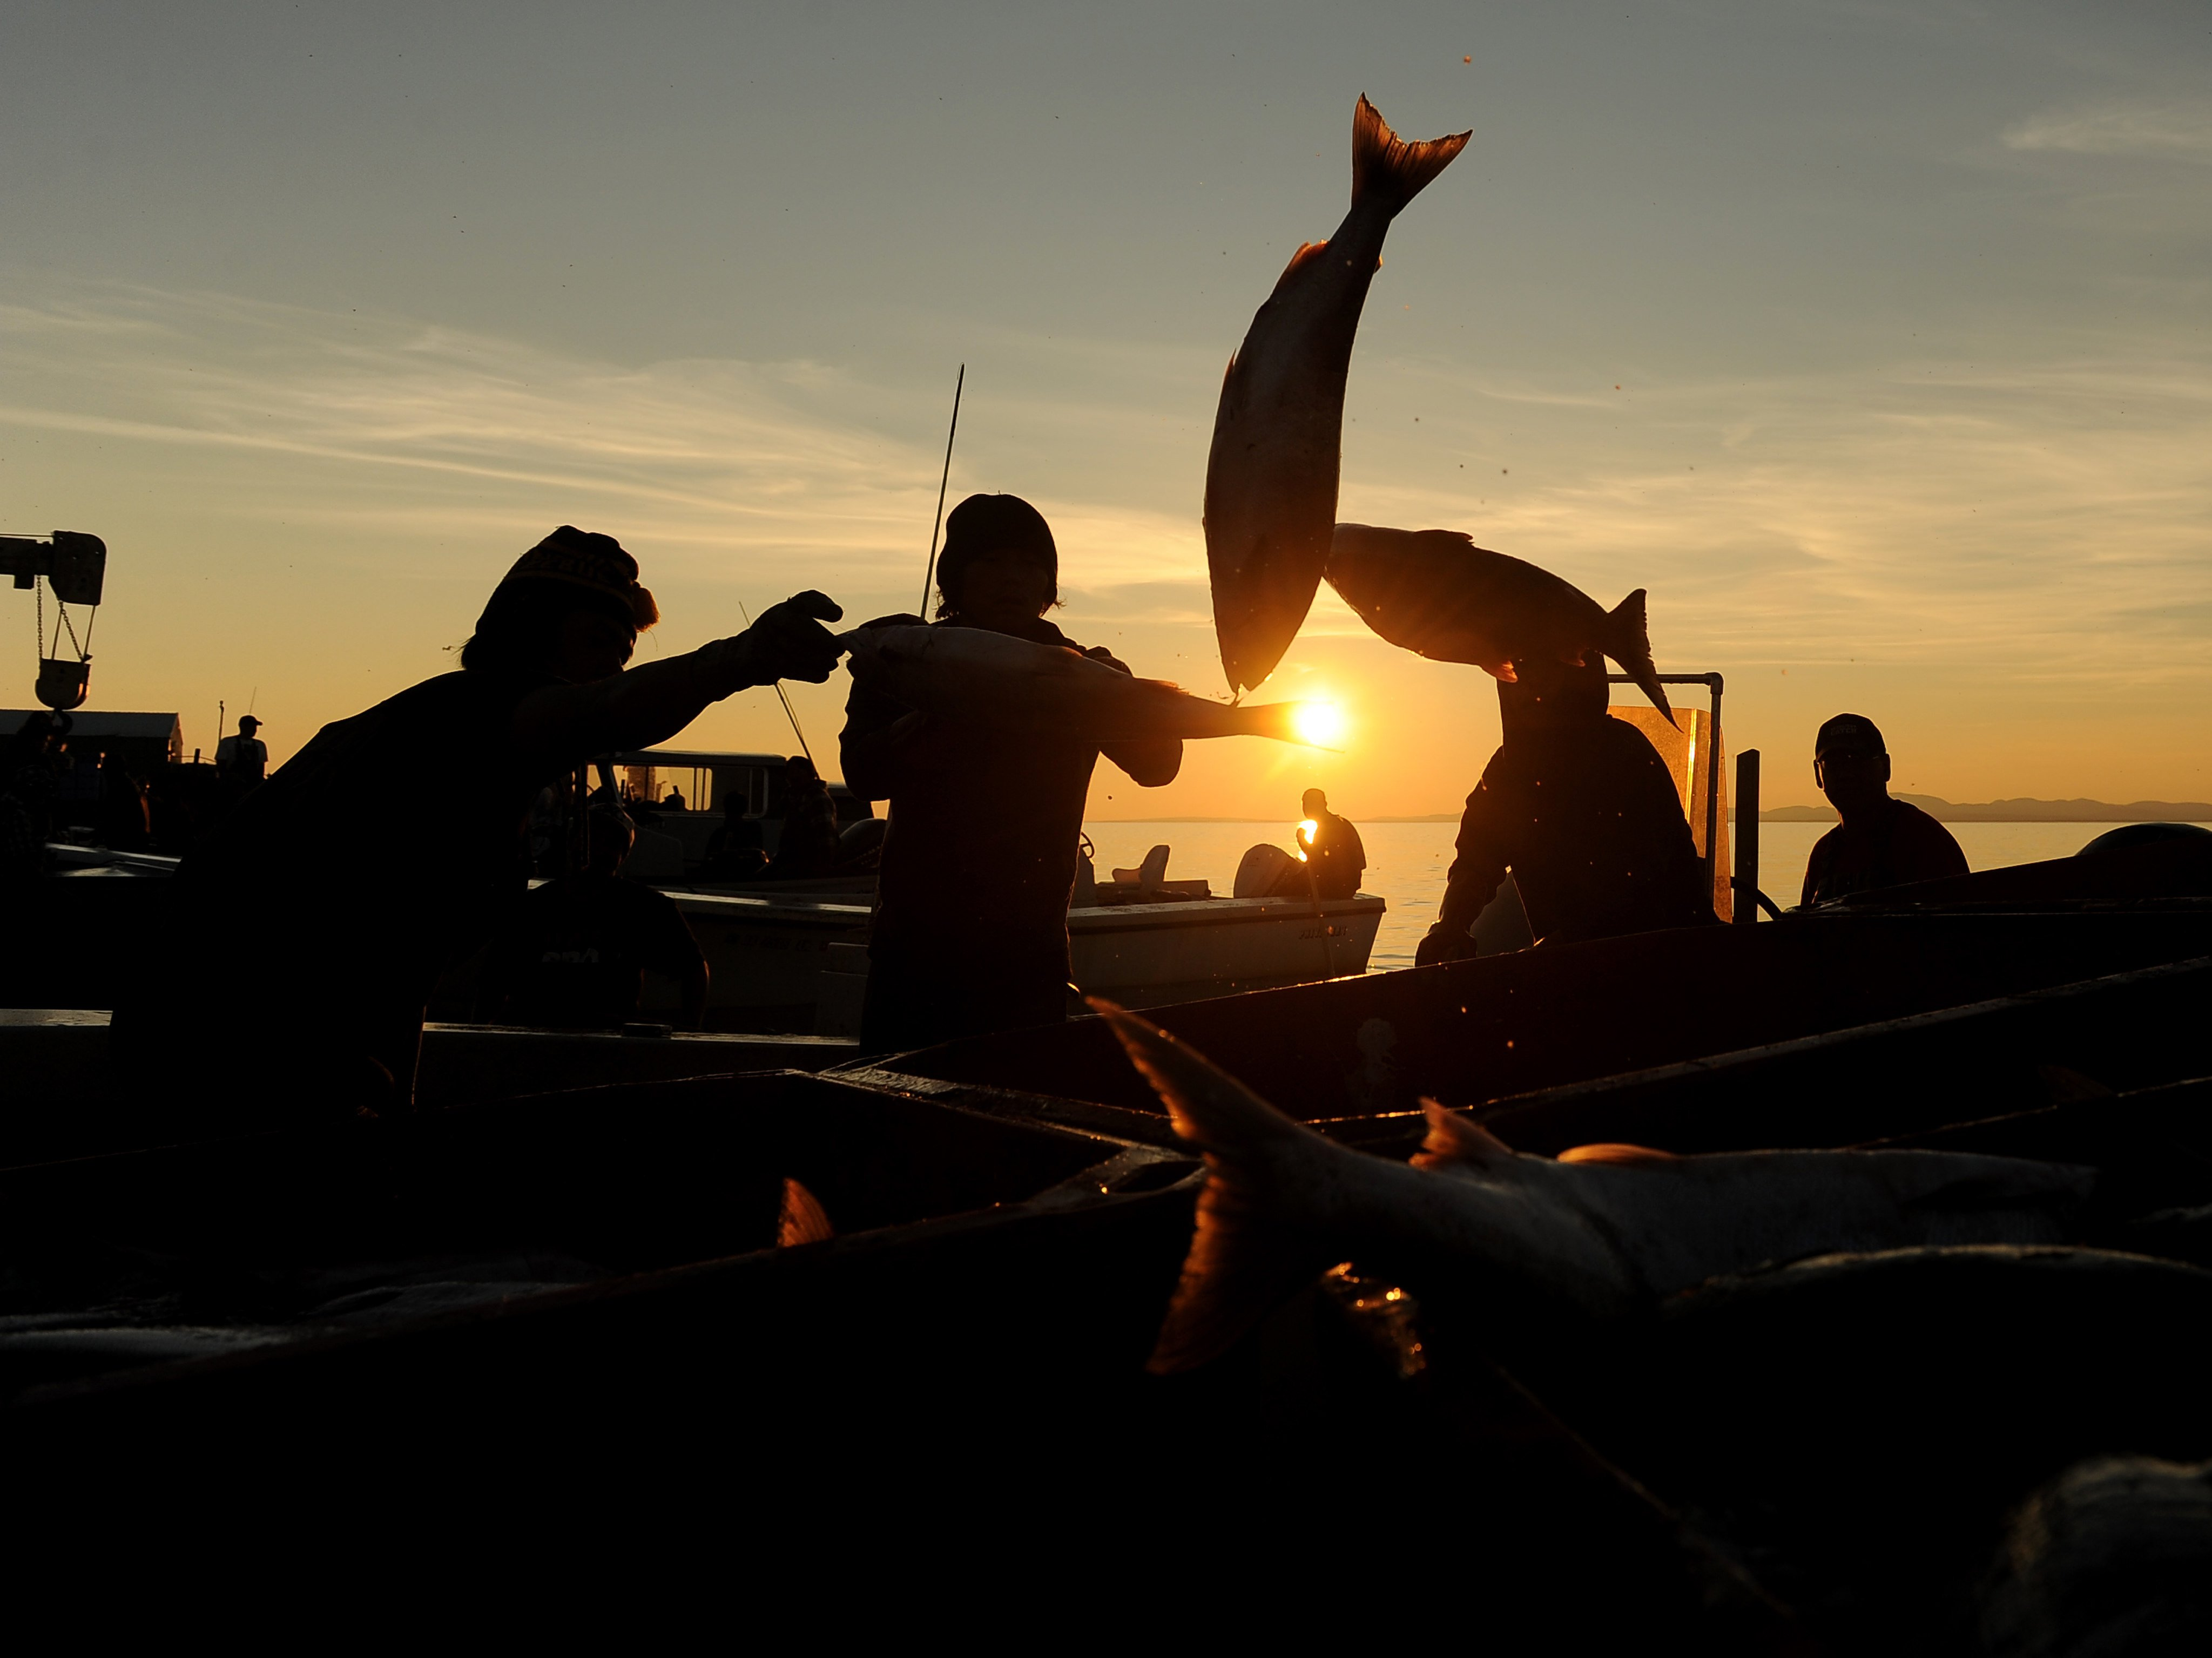 No agreement on Arctic fisheries moratorium